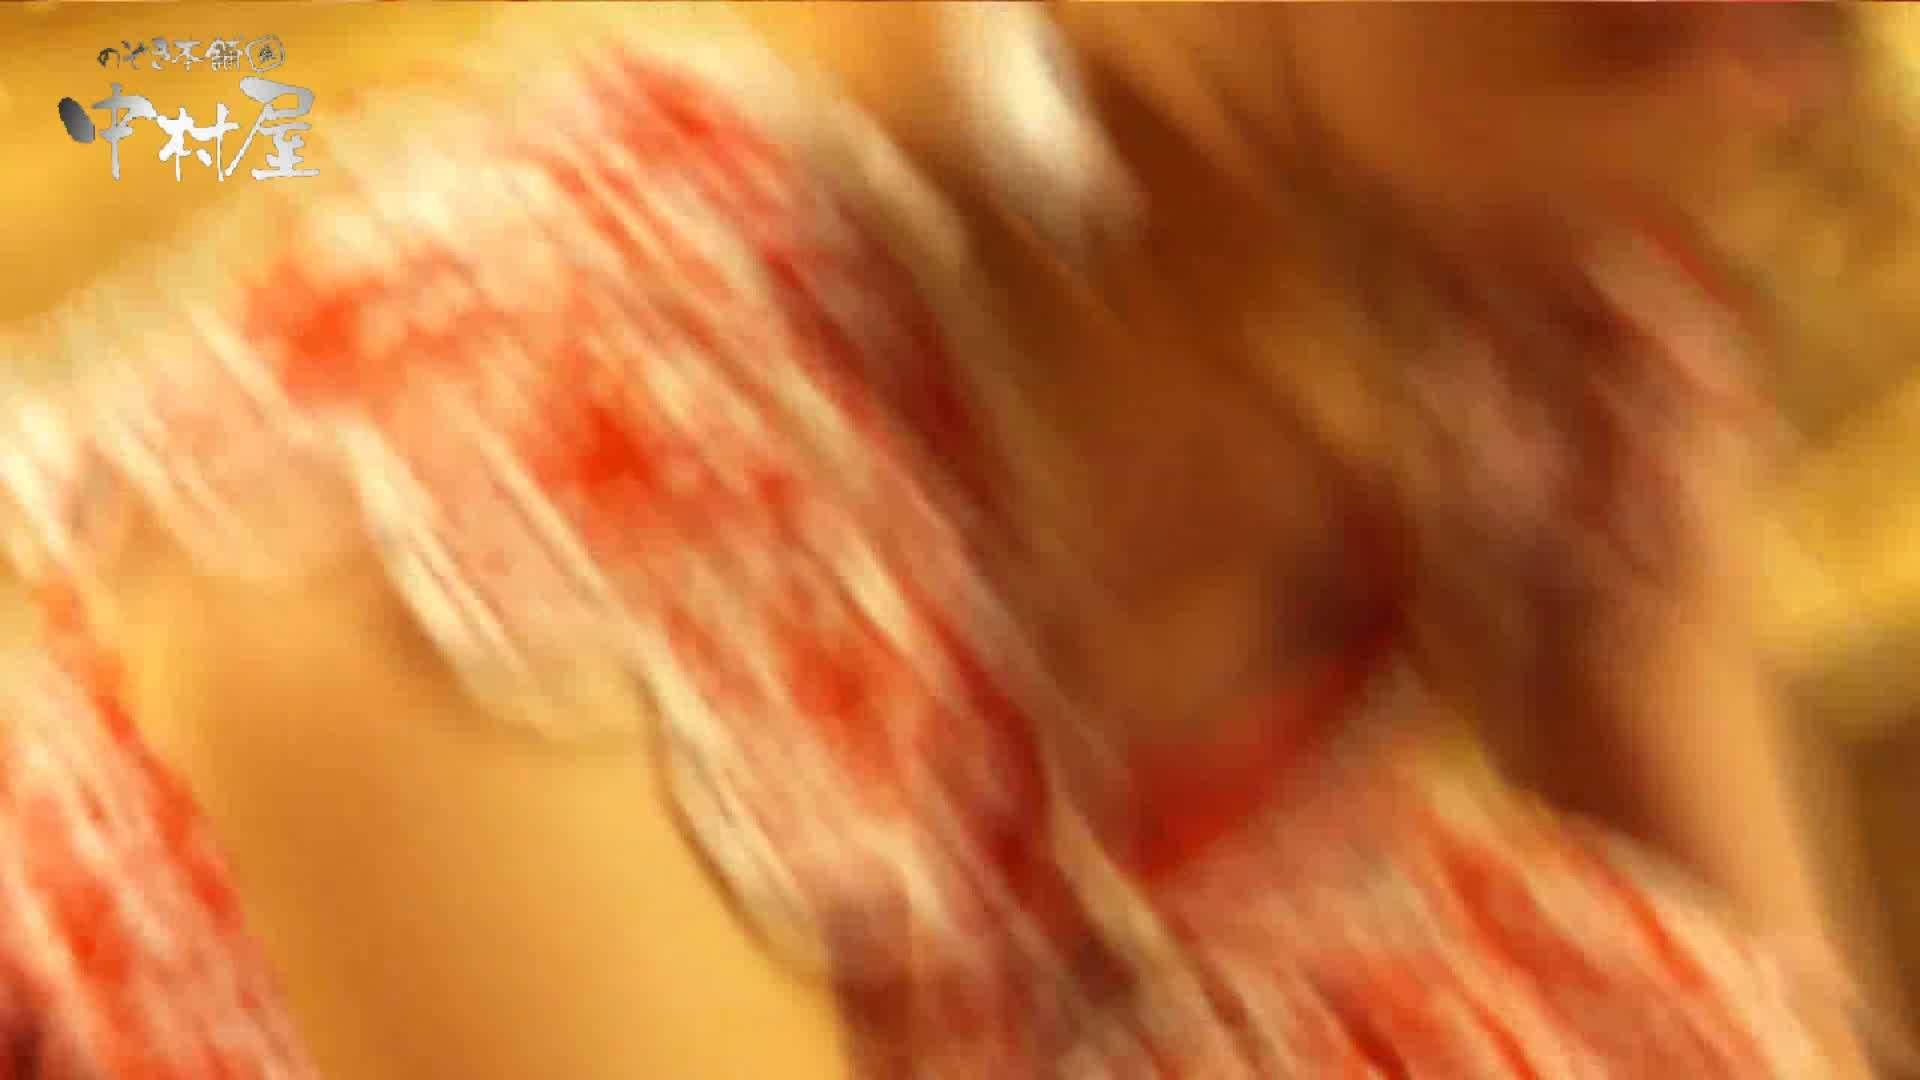 vol.43 可愛いカリスマ店員限定‼胸チラ&パンチラ 美脚おねーさんの胸元ゲット! エロティックなOL AV無料動画キャプチャ 86画像 80